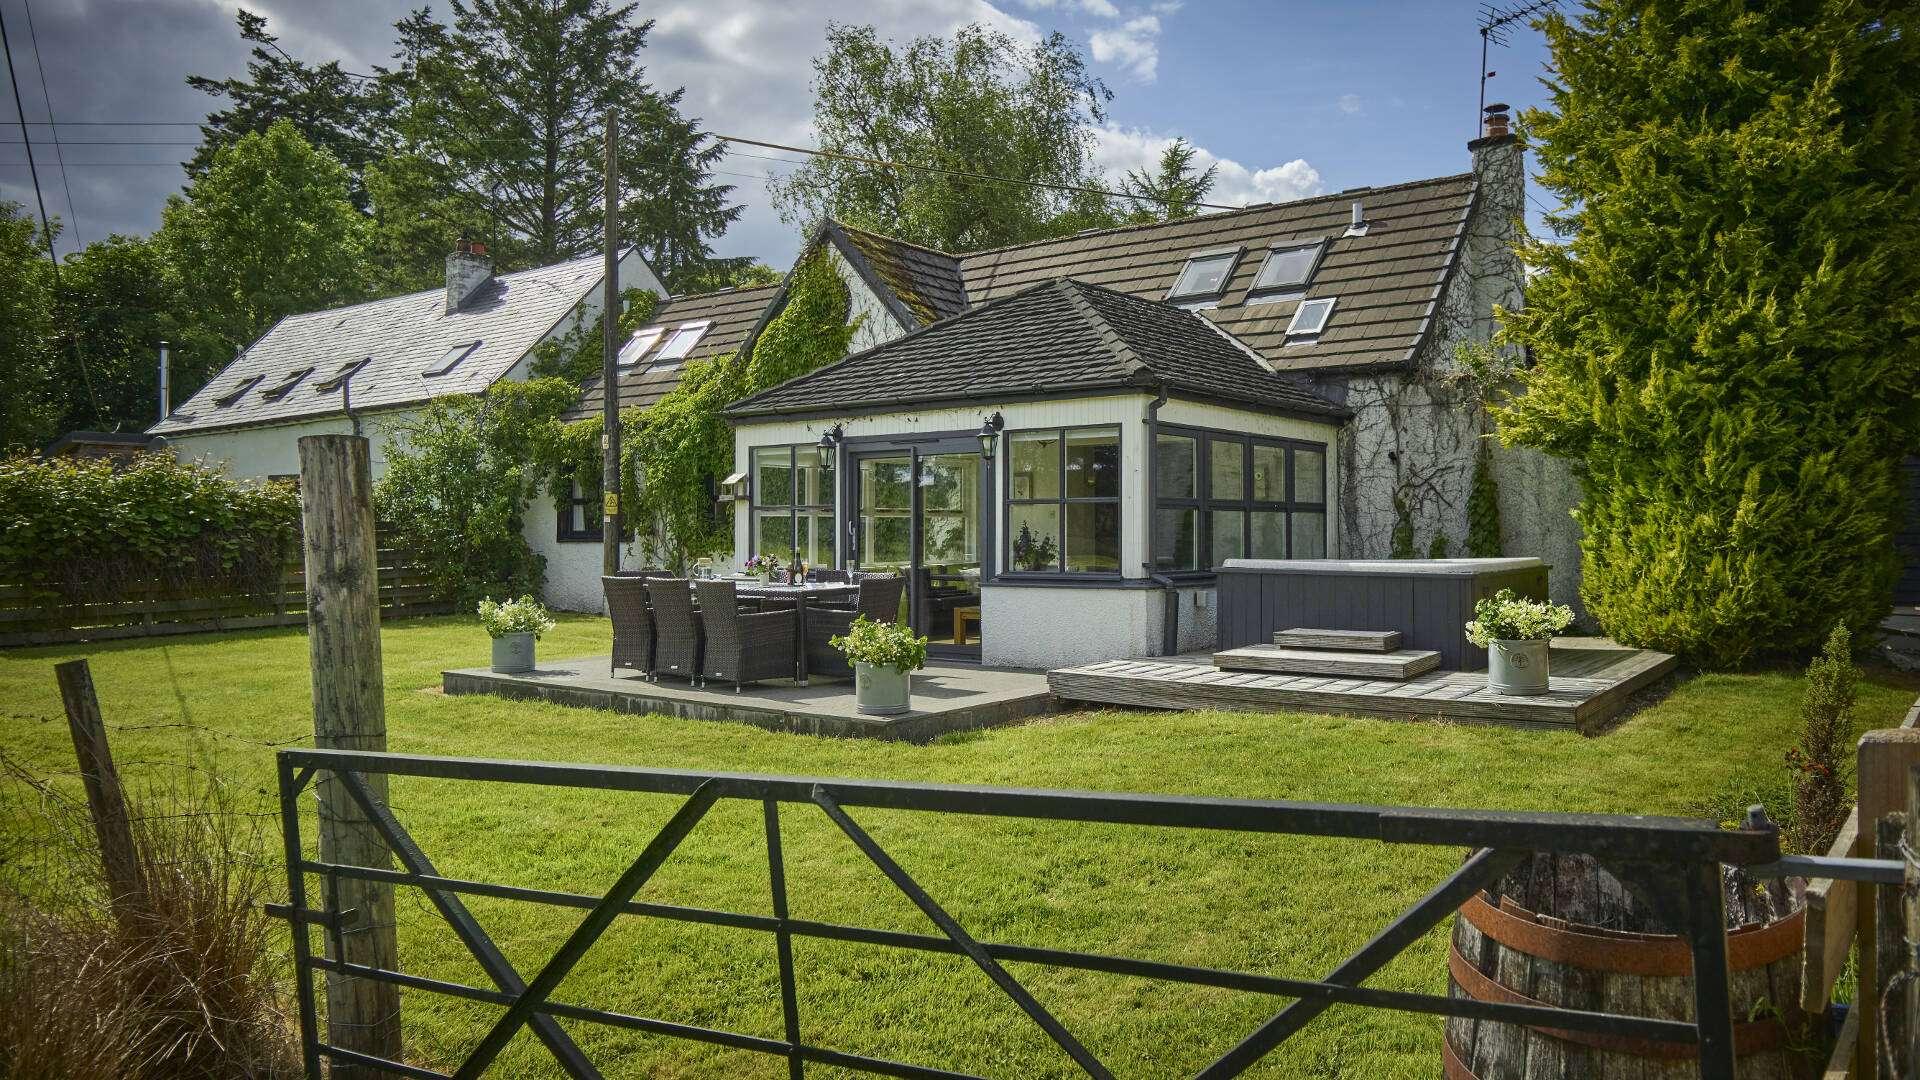 Lochend Chalets Accommodation